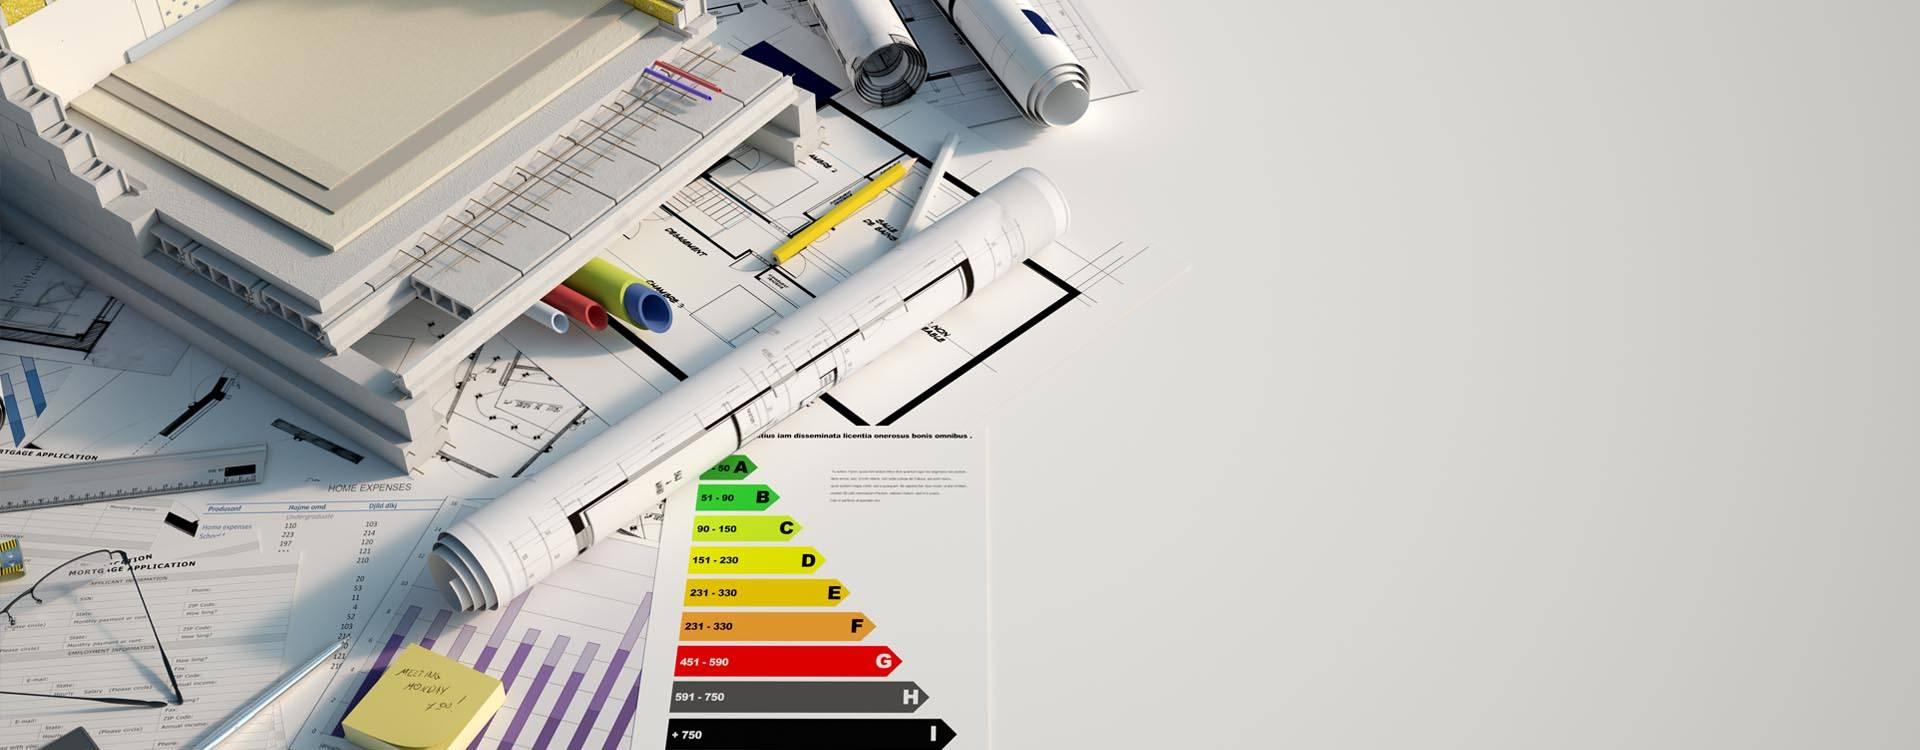 Ecobonus 110%: come funziona?